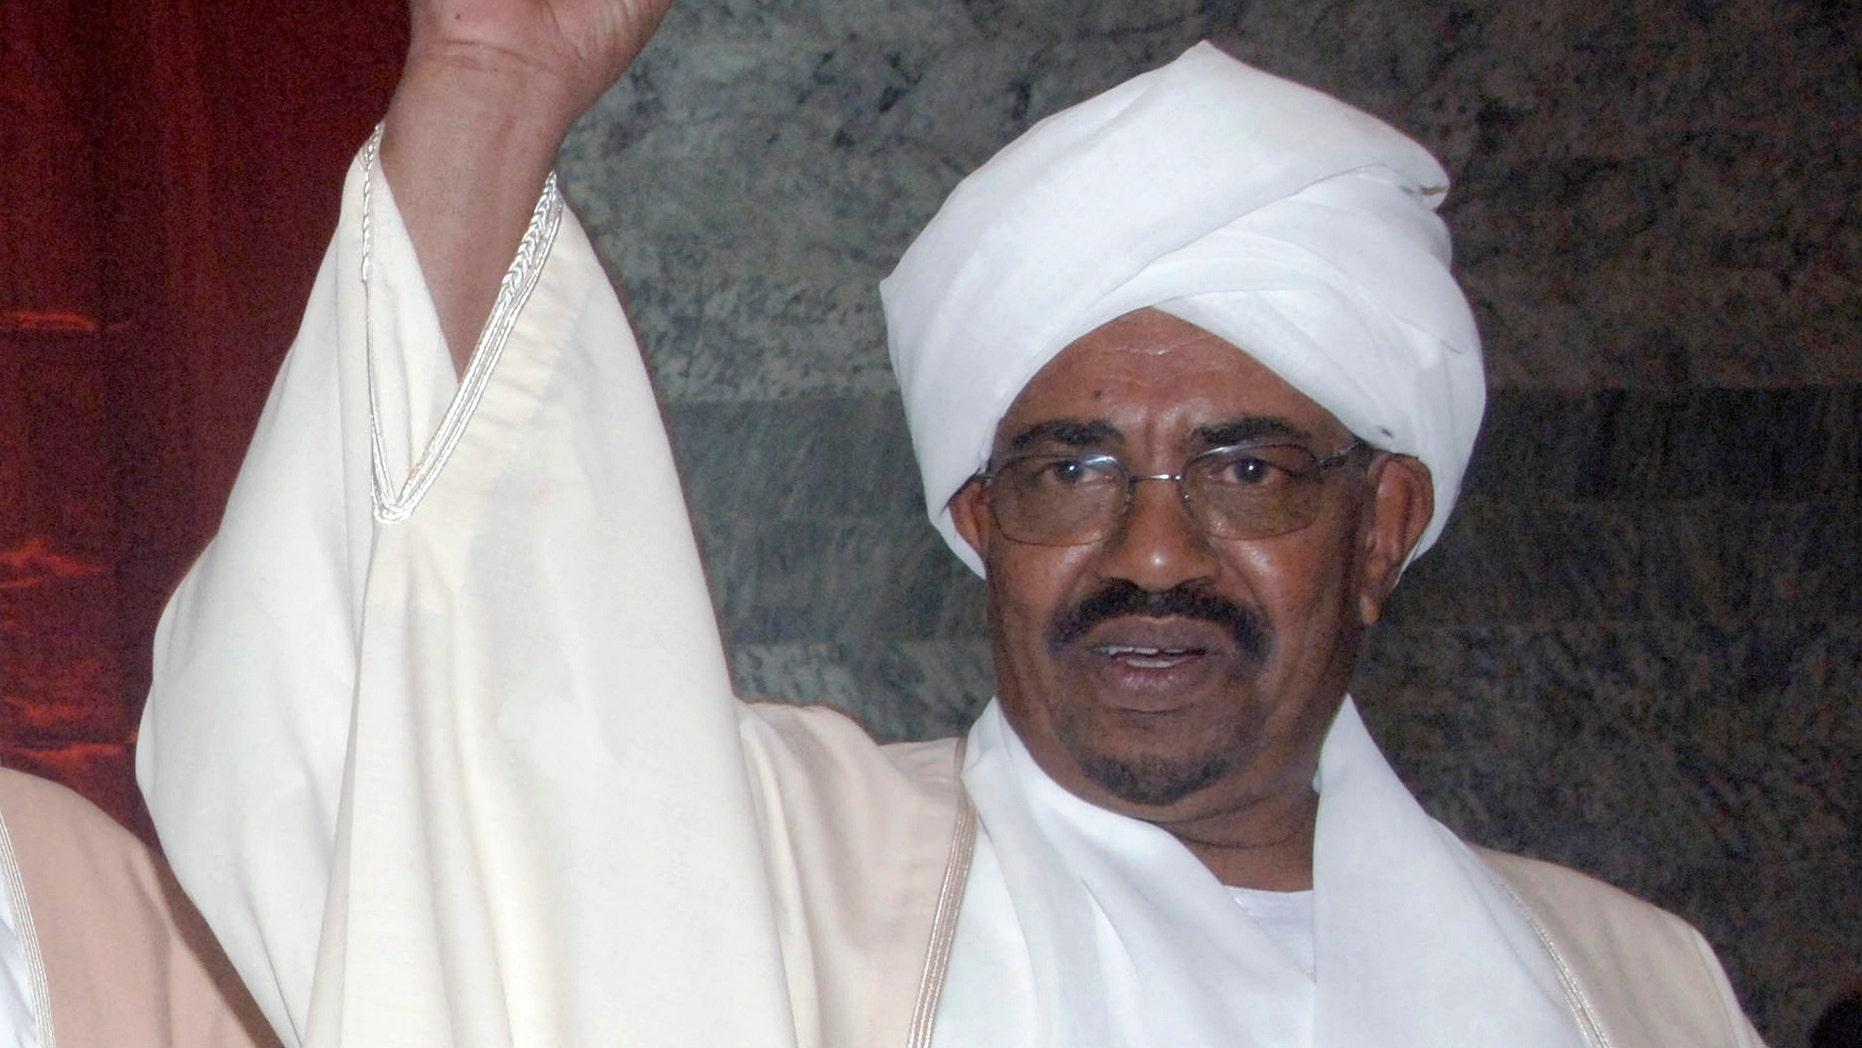 May 27: Sudan's president Omar al-Bashir gestures prior to being sworn in, at the parliament in Khartoum, Sudan. (AP)